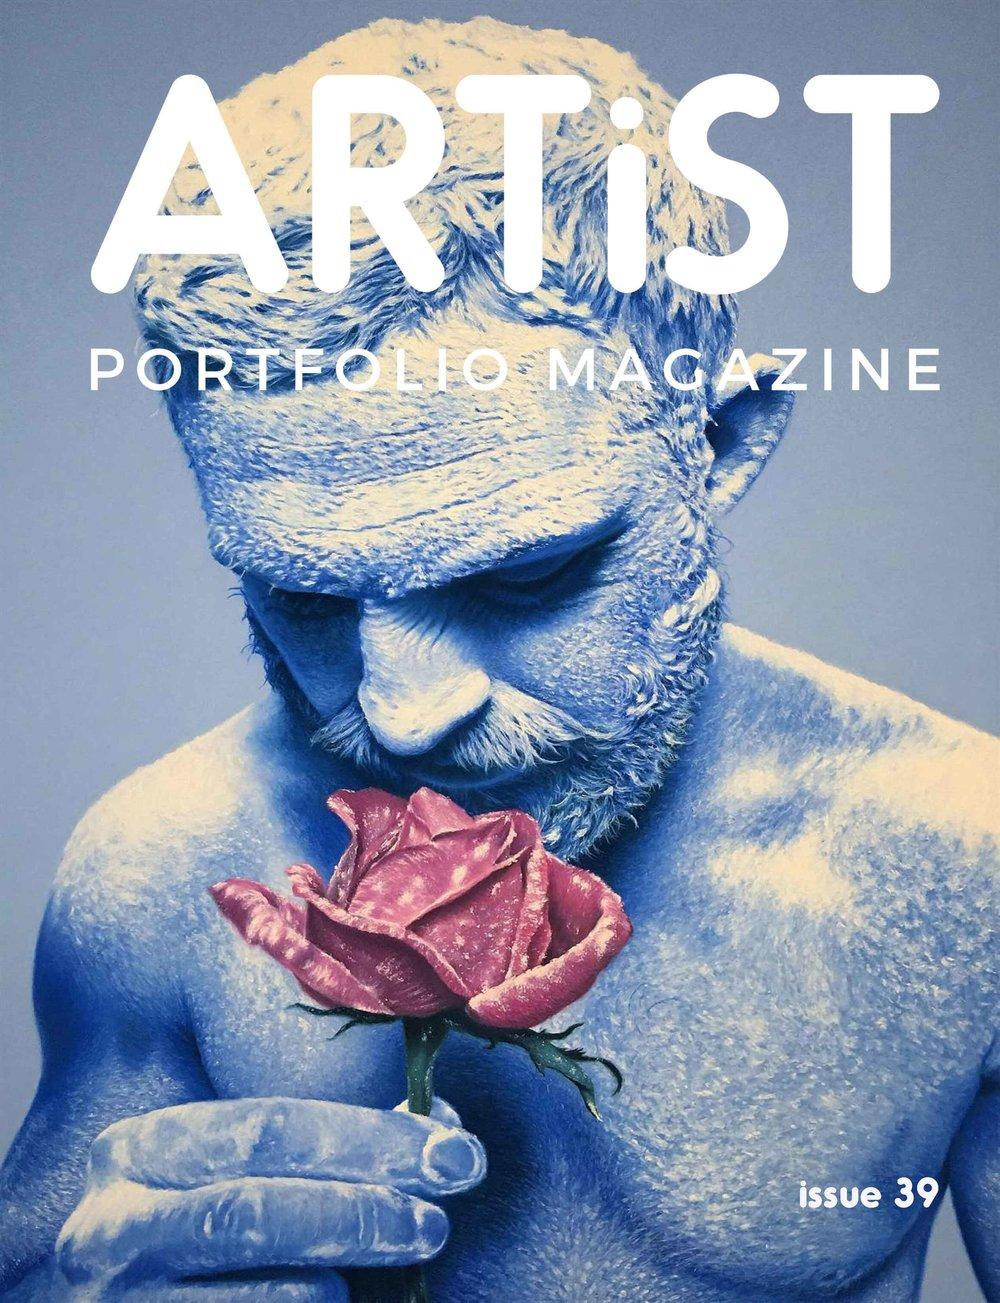 Artist Portfolio Magazine - My artwork included in Issue 39.April 2019